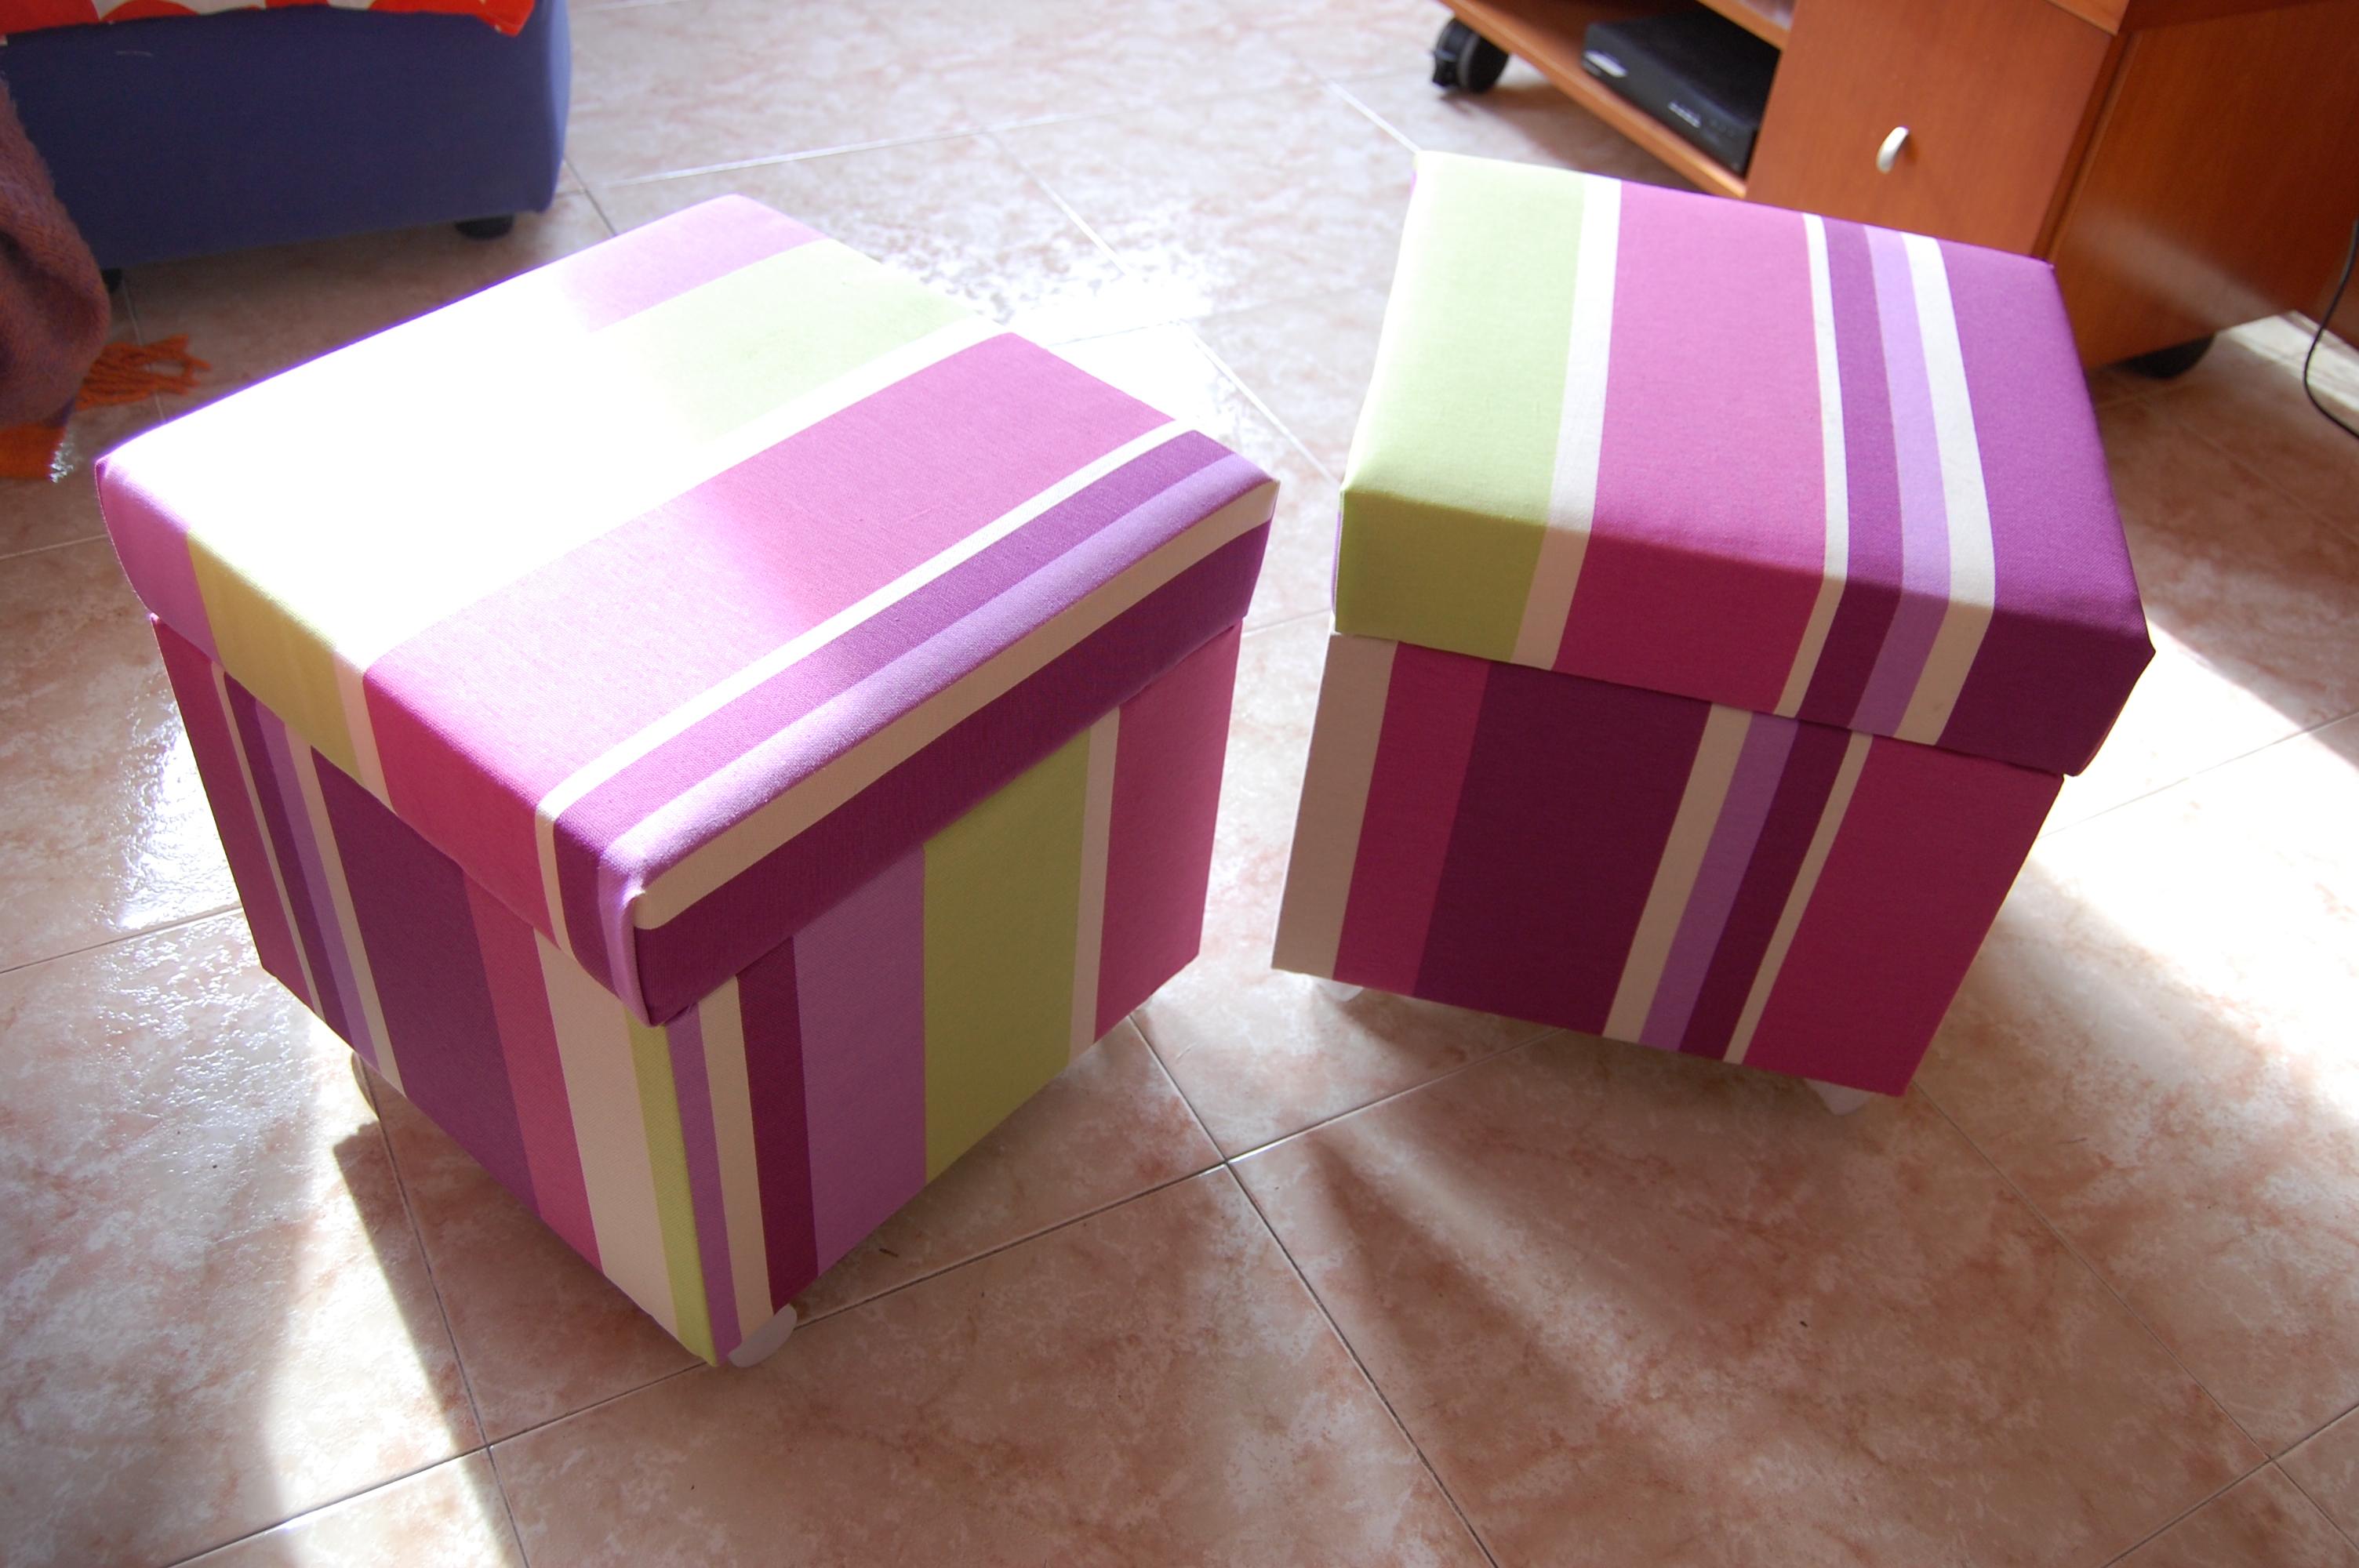 Storage space in a Solsta Pallbo footstool